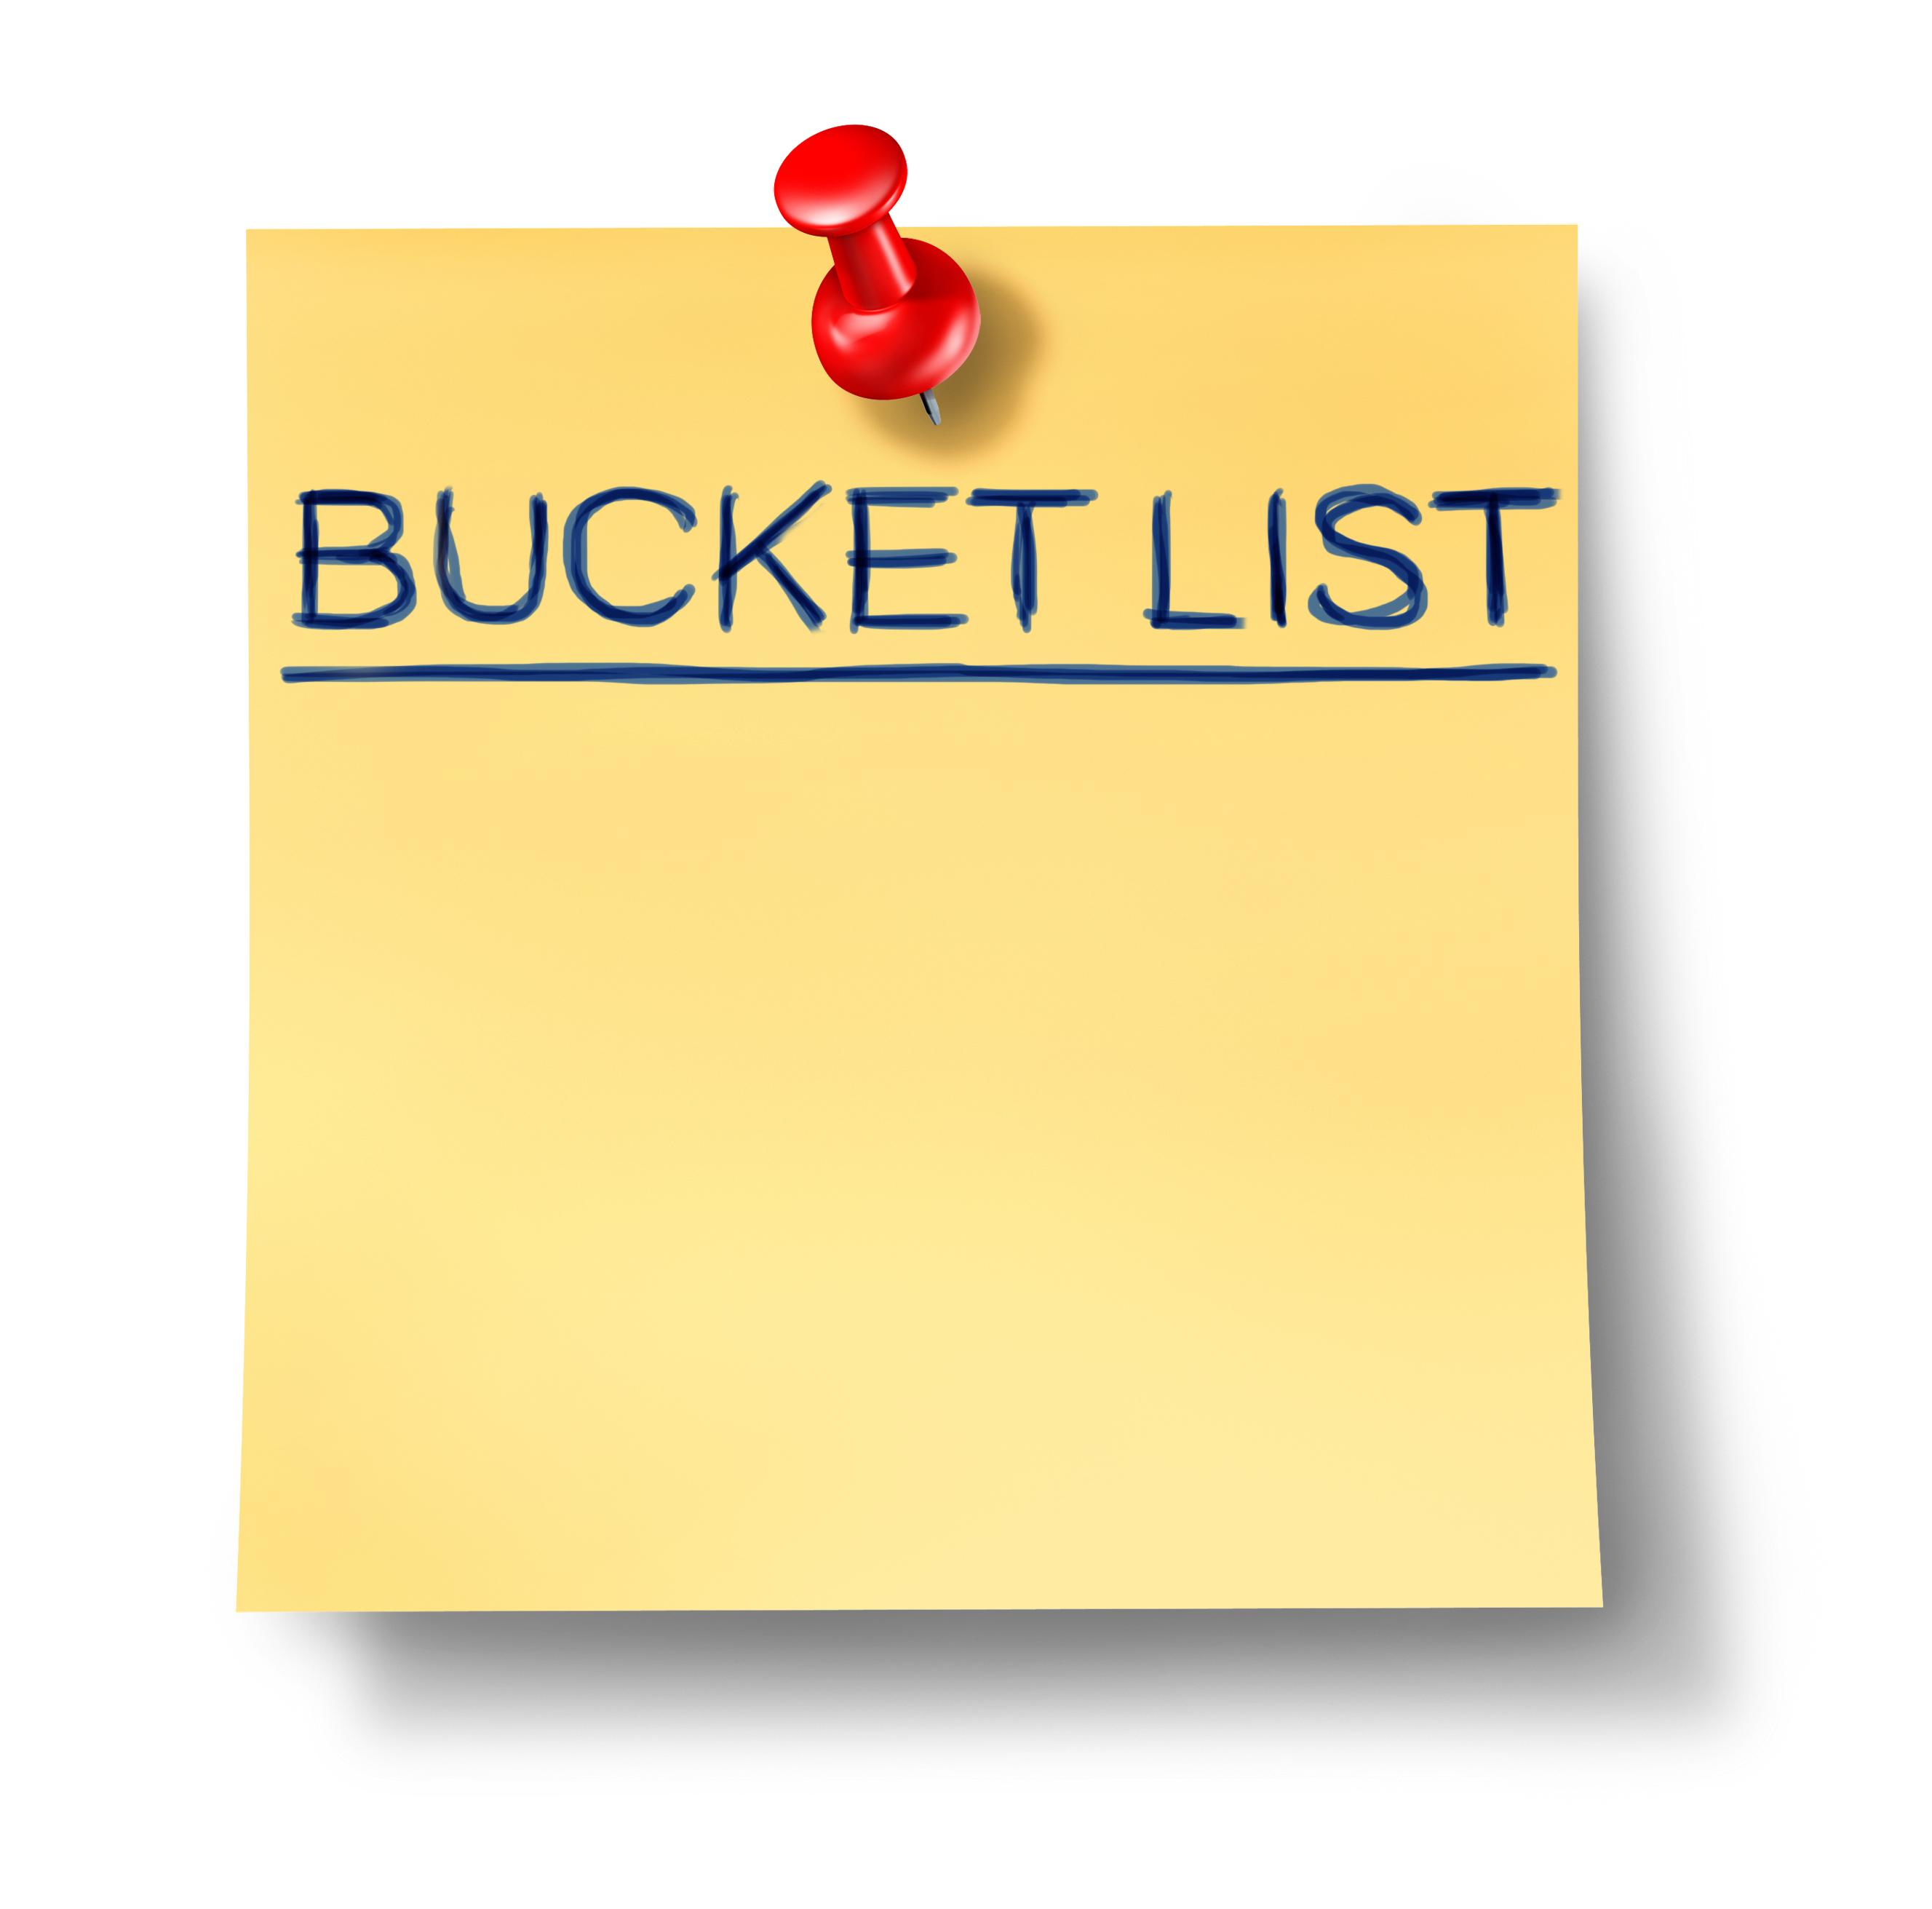 Bucket Summer Tumblr List